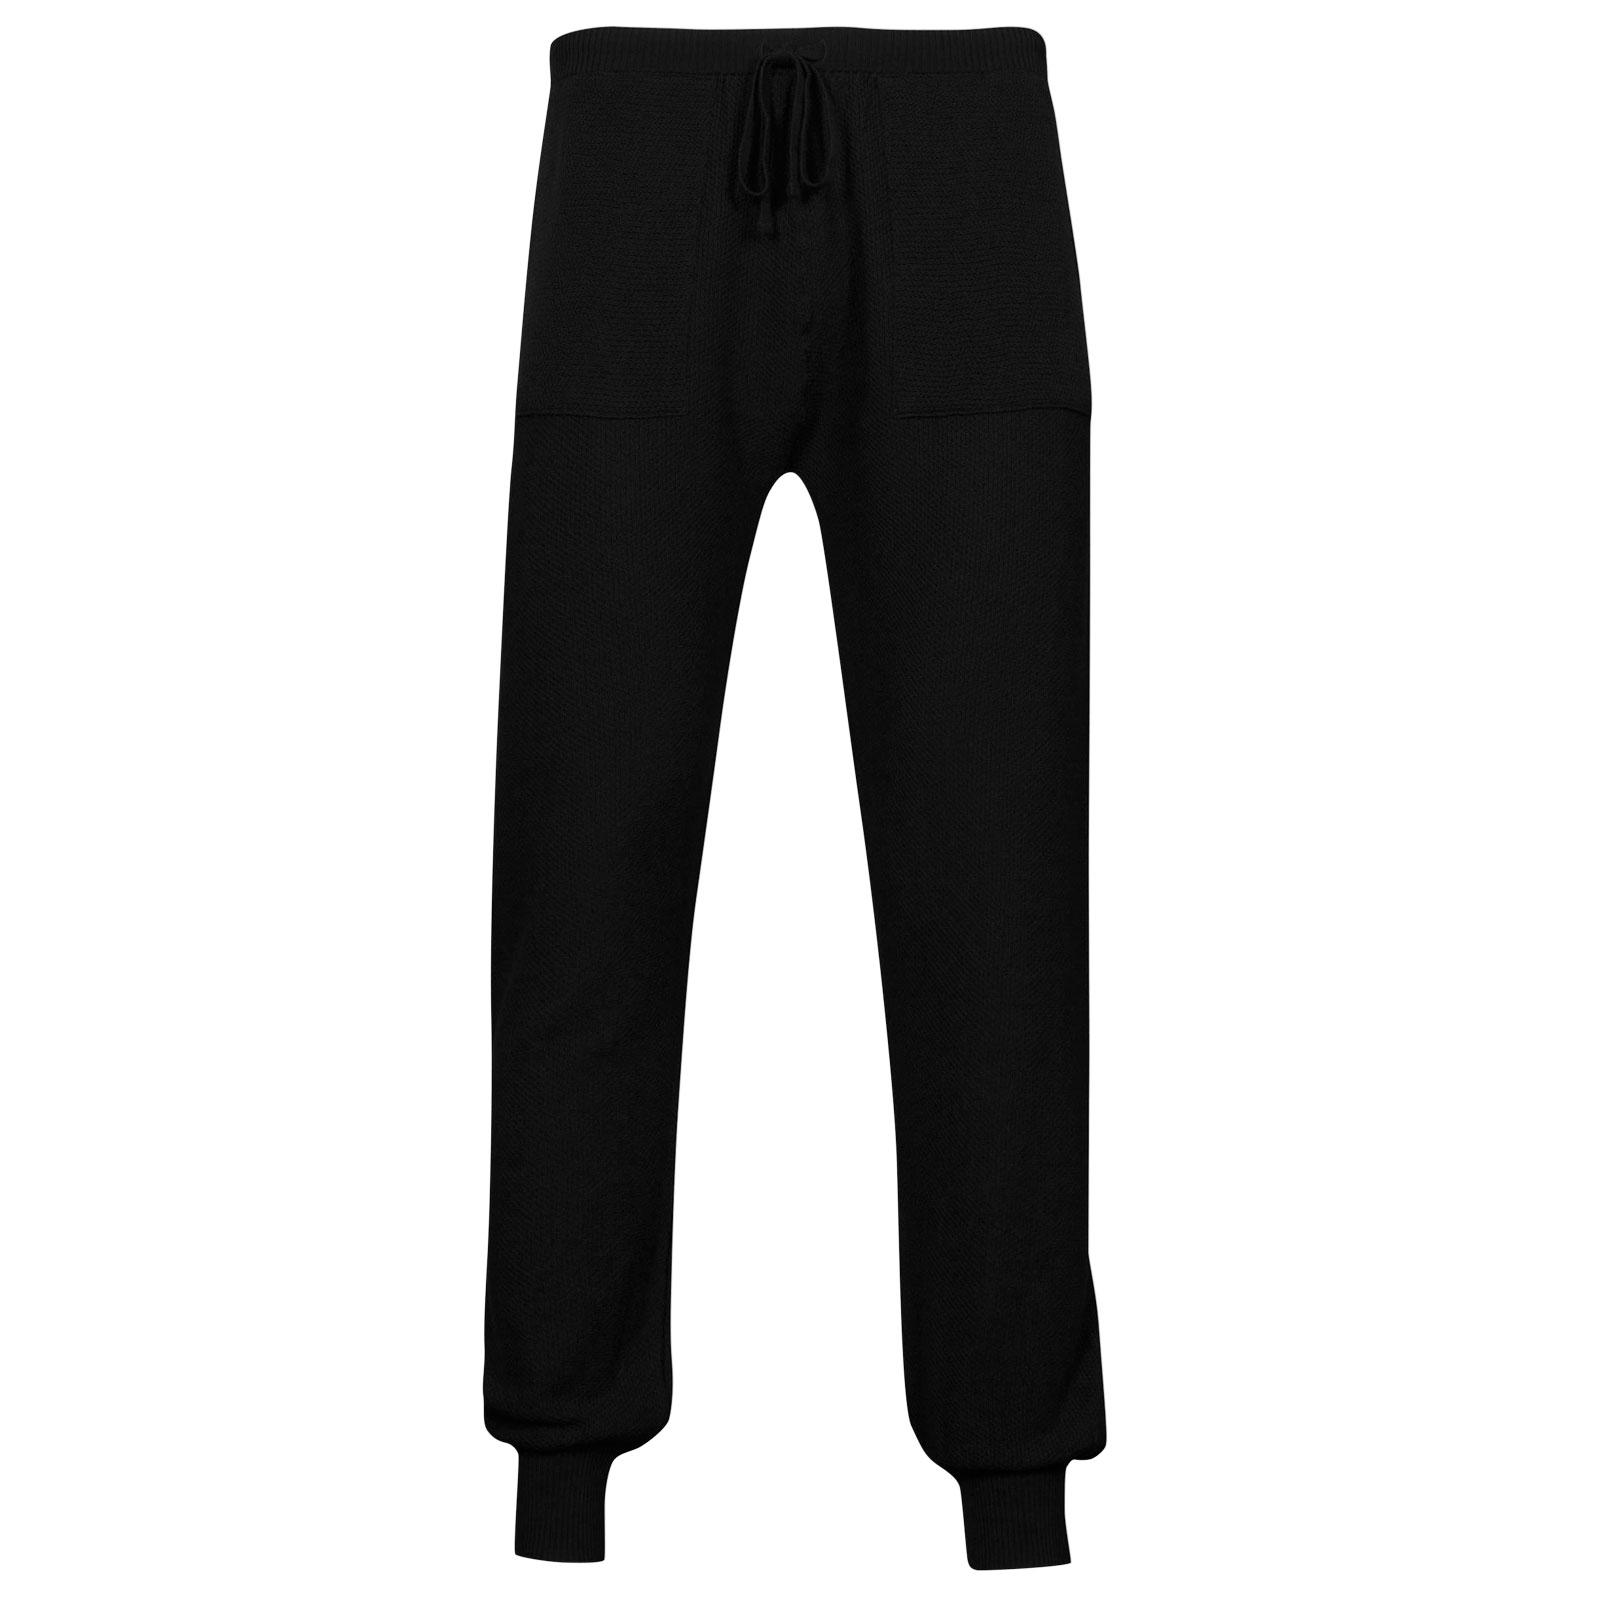 John Smedley 5Singular Merino Wool Trouser in Black-XS